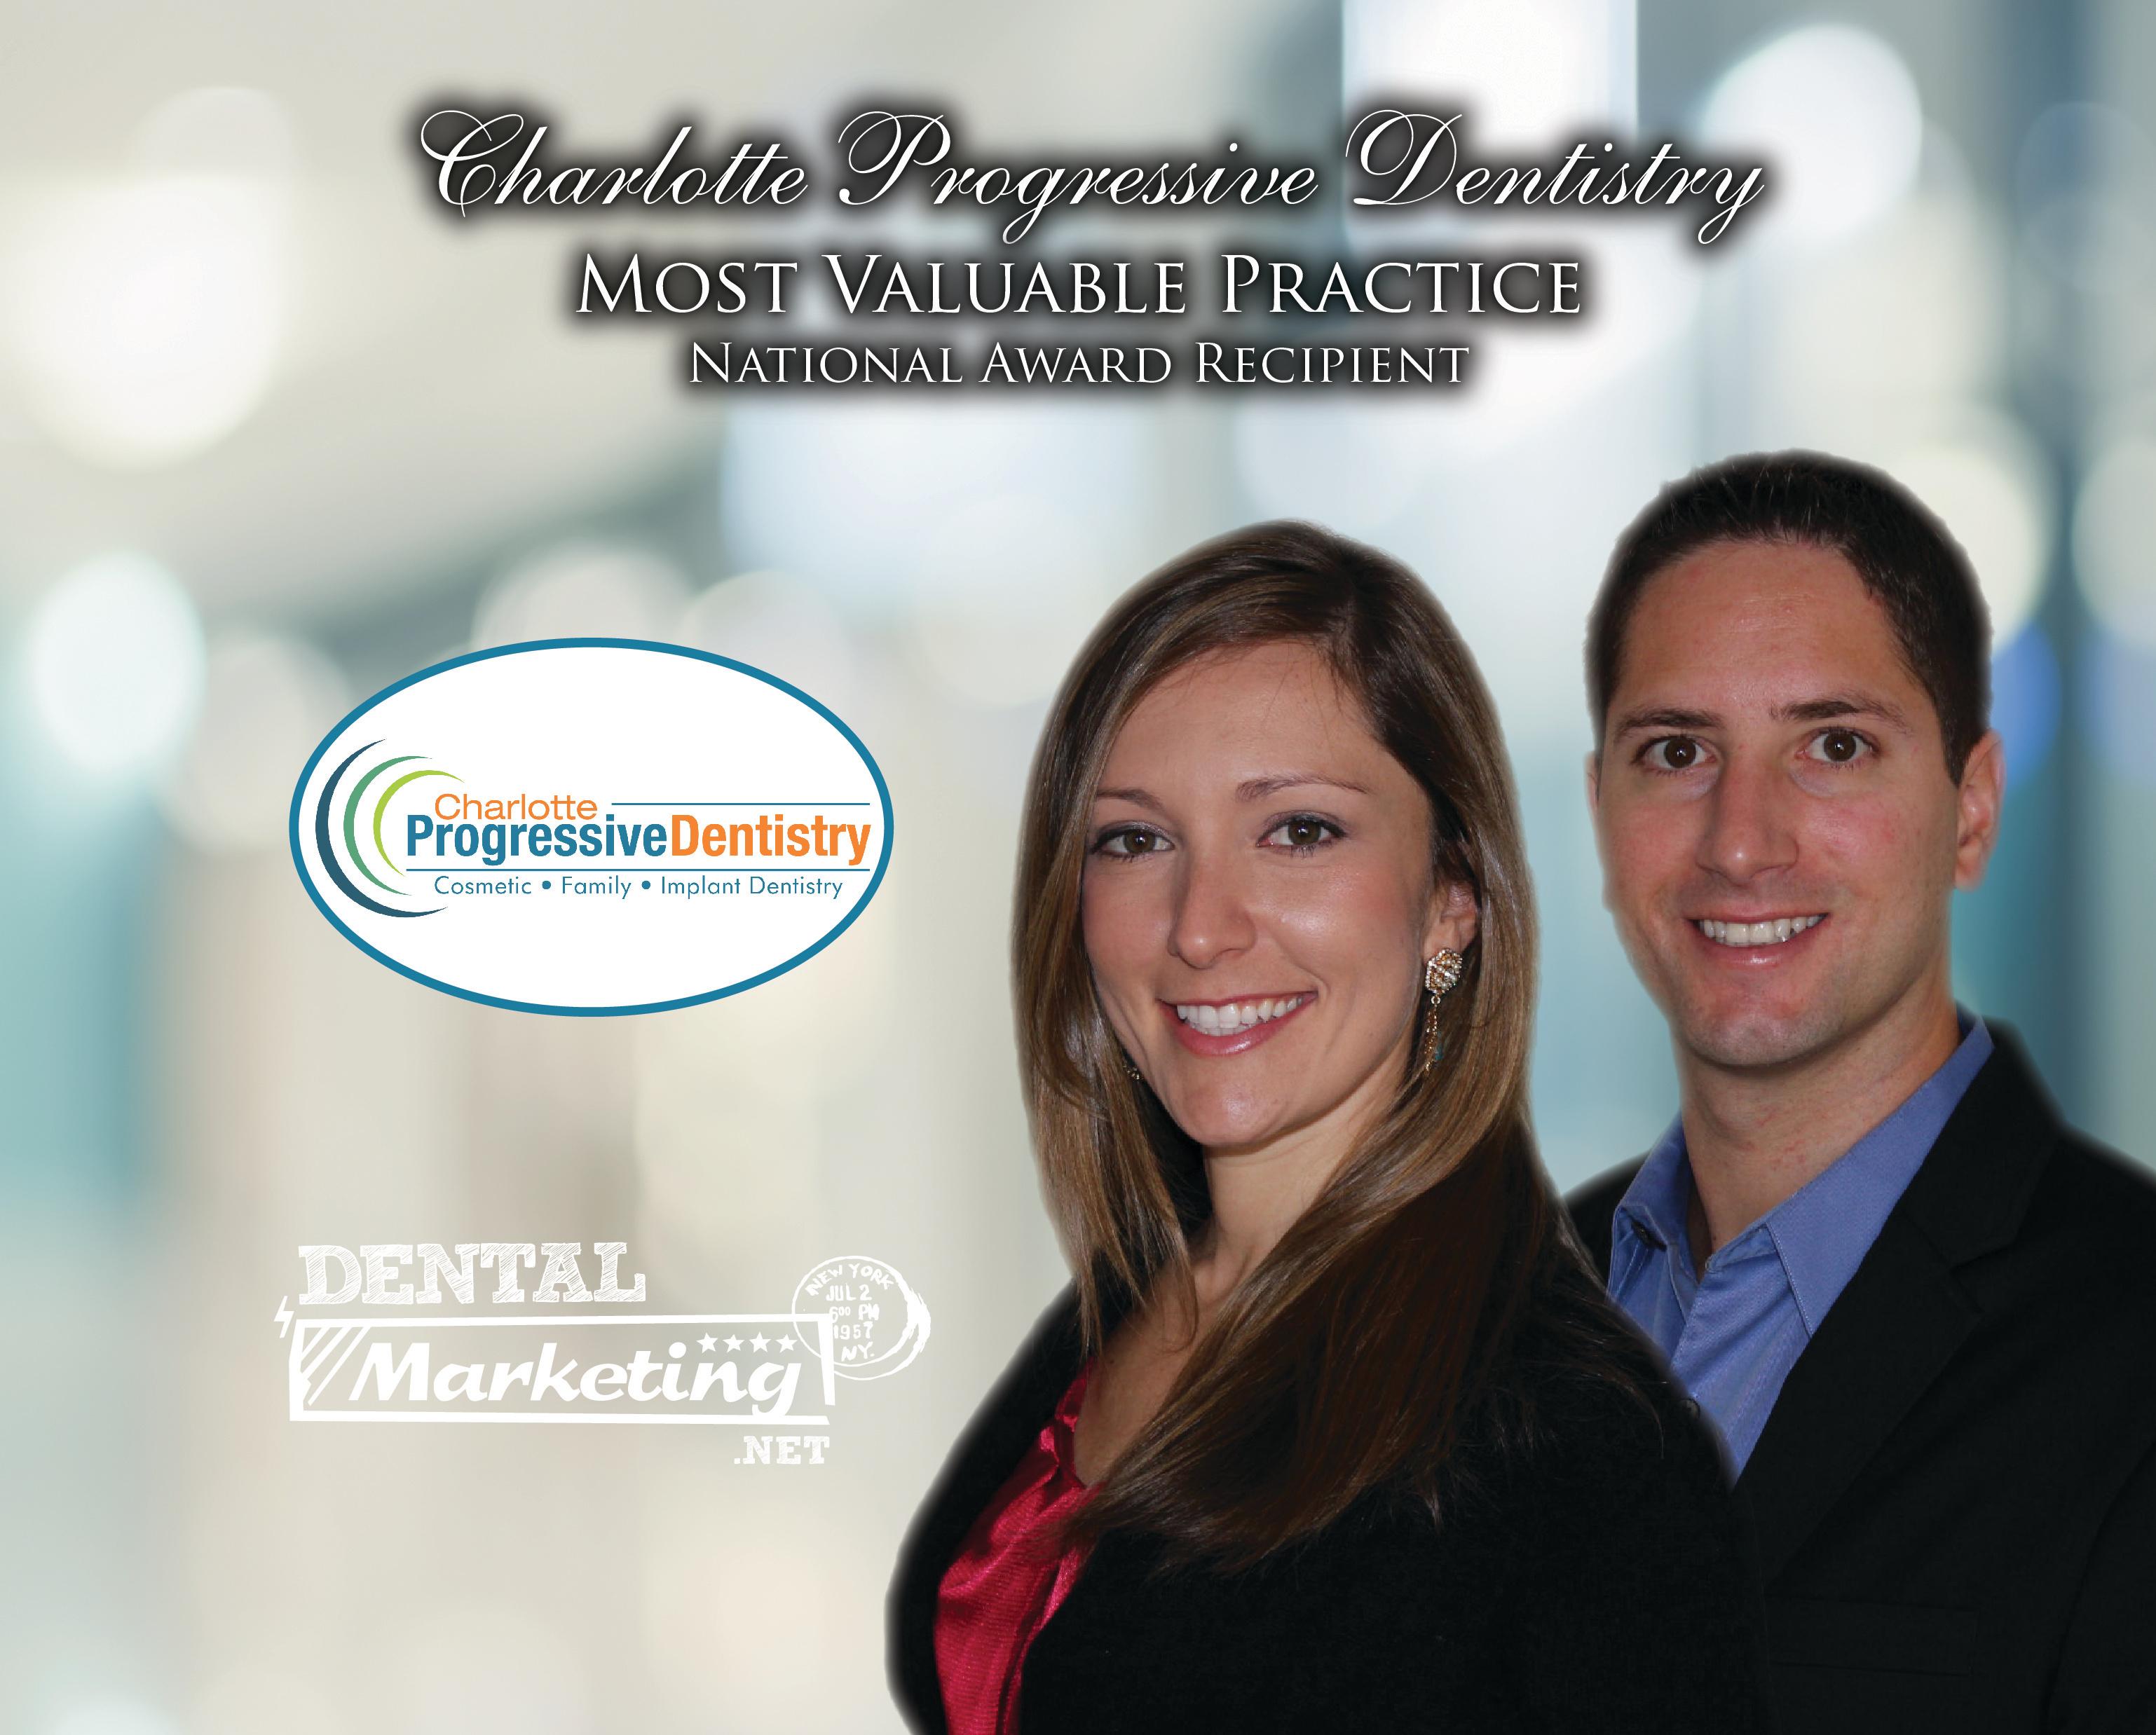 Charlotte Progressive Dentistry MVP Award